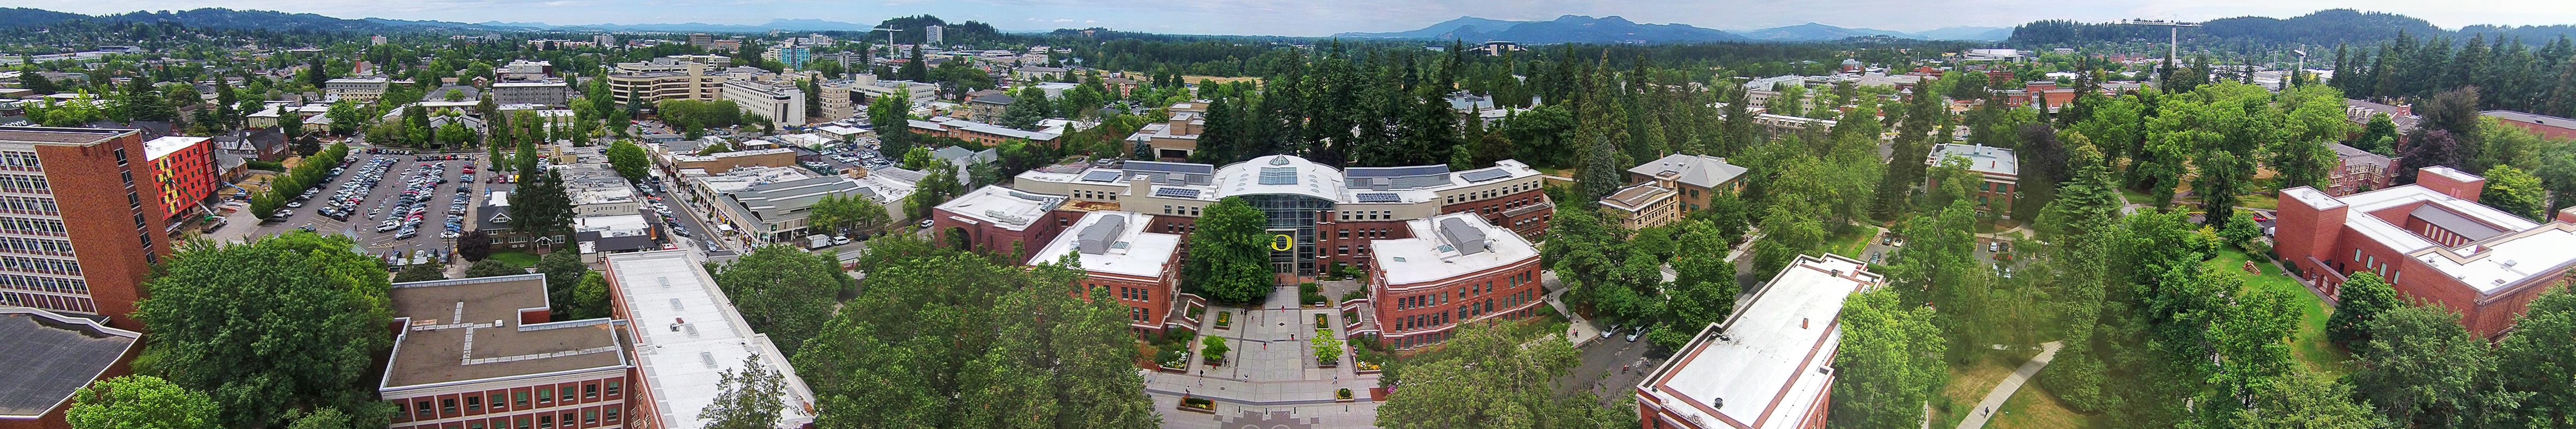 2014-07-22 University of Oregon Lillis Center panorama